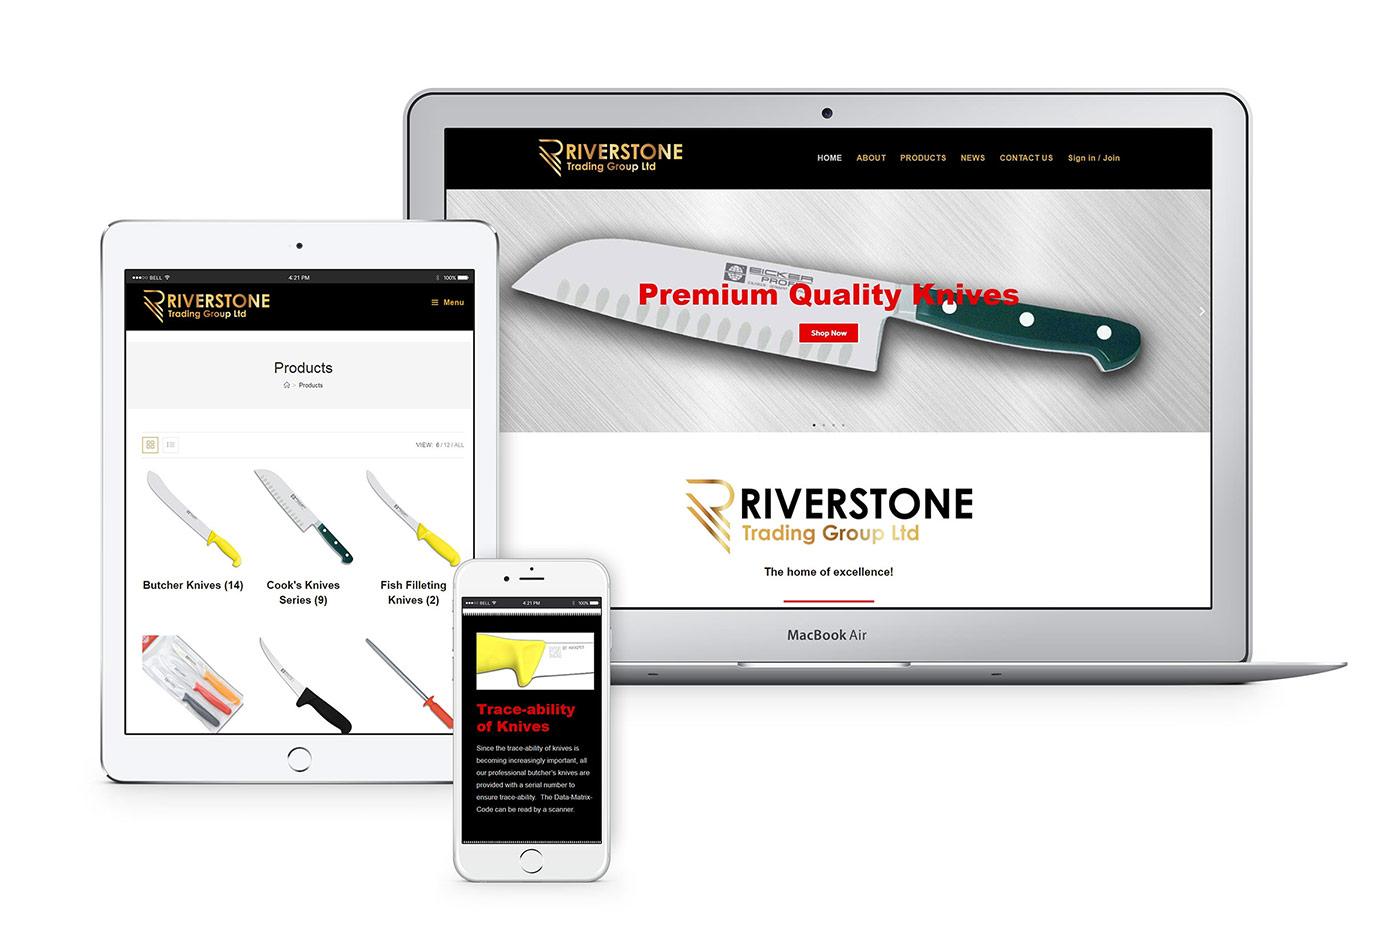 Riverstone Trading Group website & branding